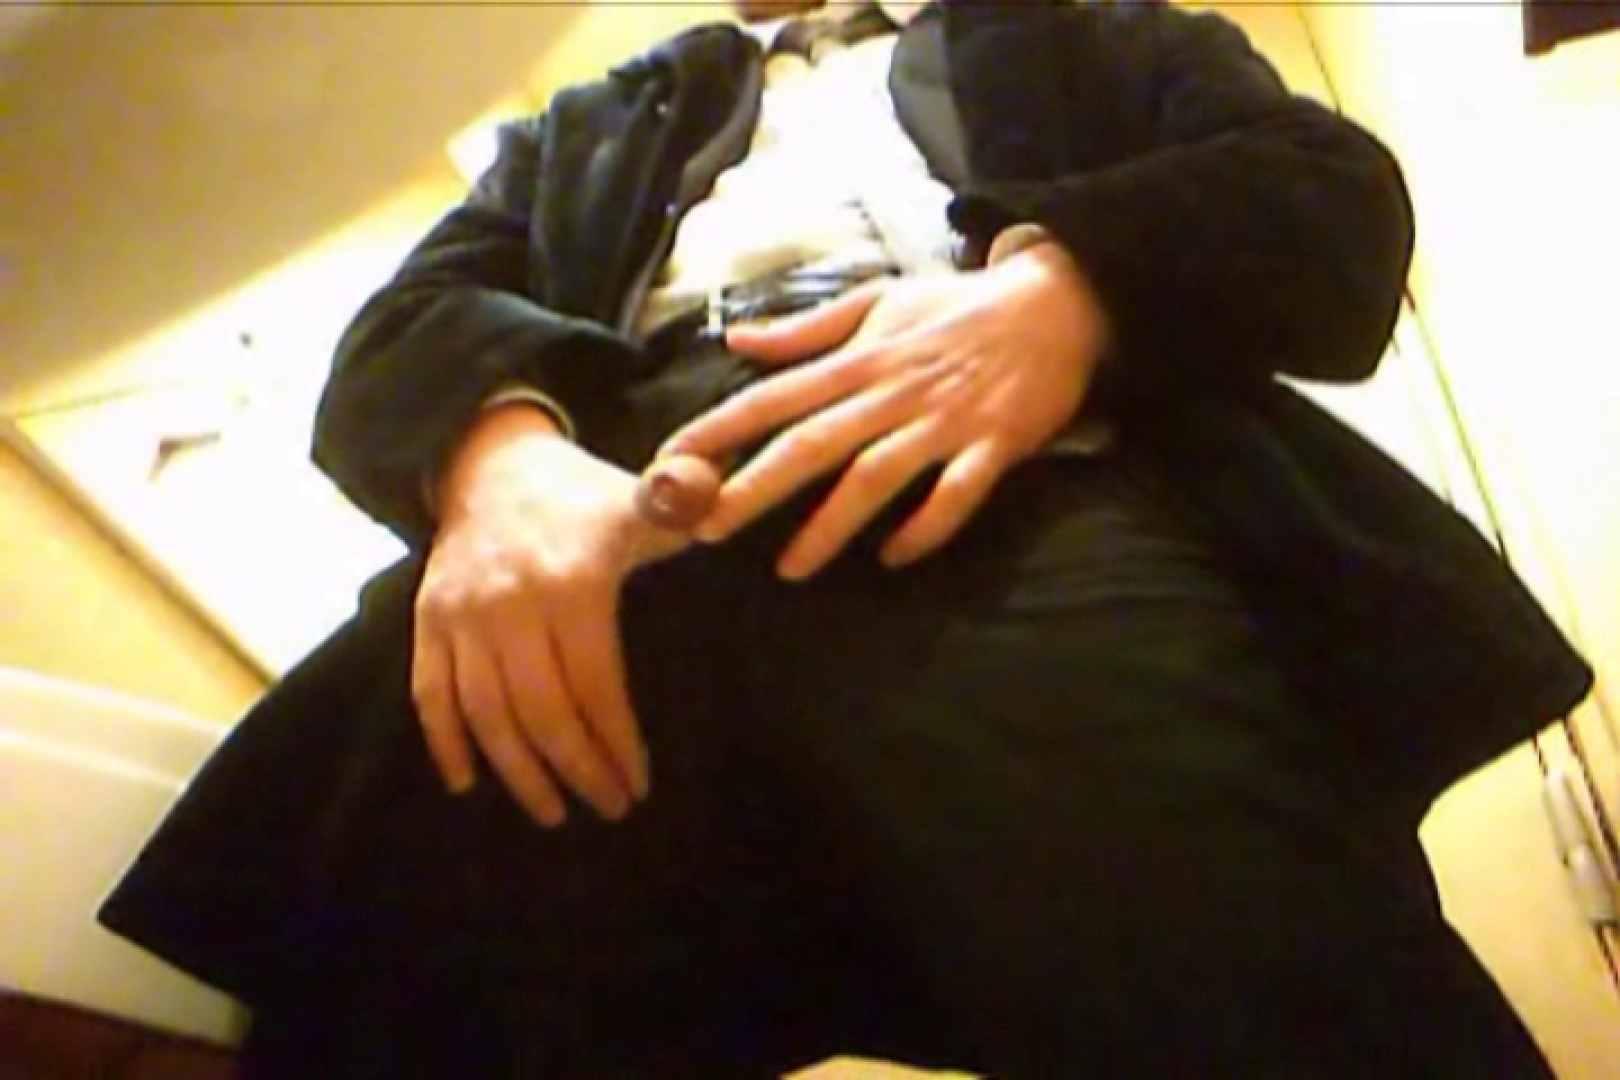 SEASON 2ND!掴み取りさんの洗面所覗き!in新幹線!VOL.12 0 | スーツボーイズ  95pic 39